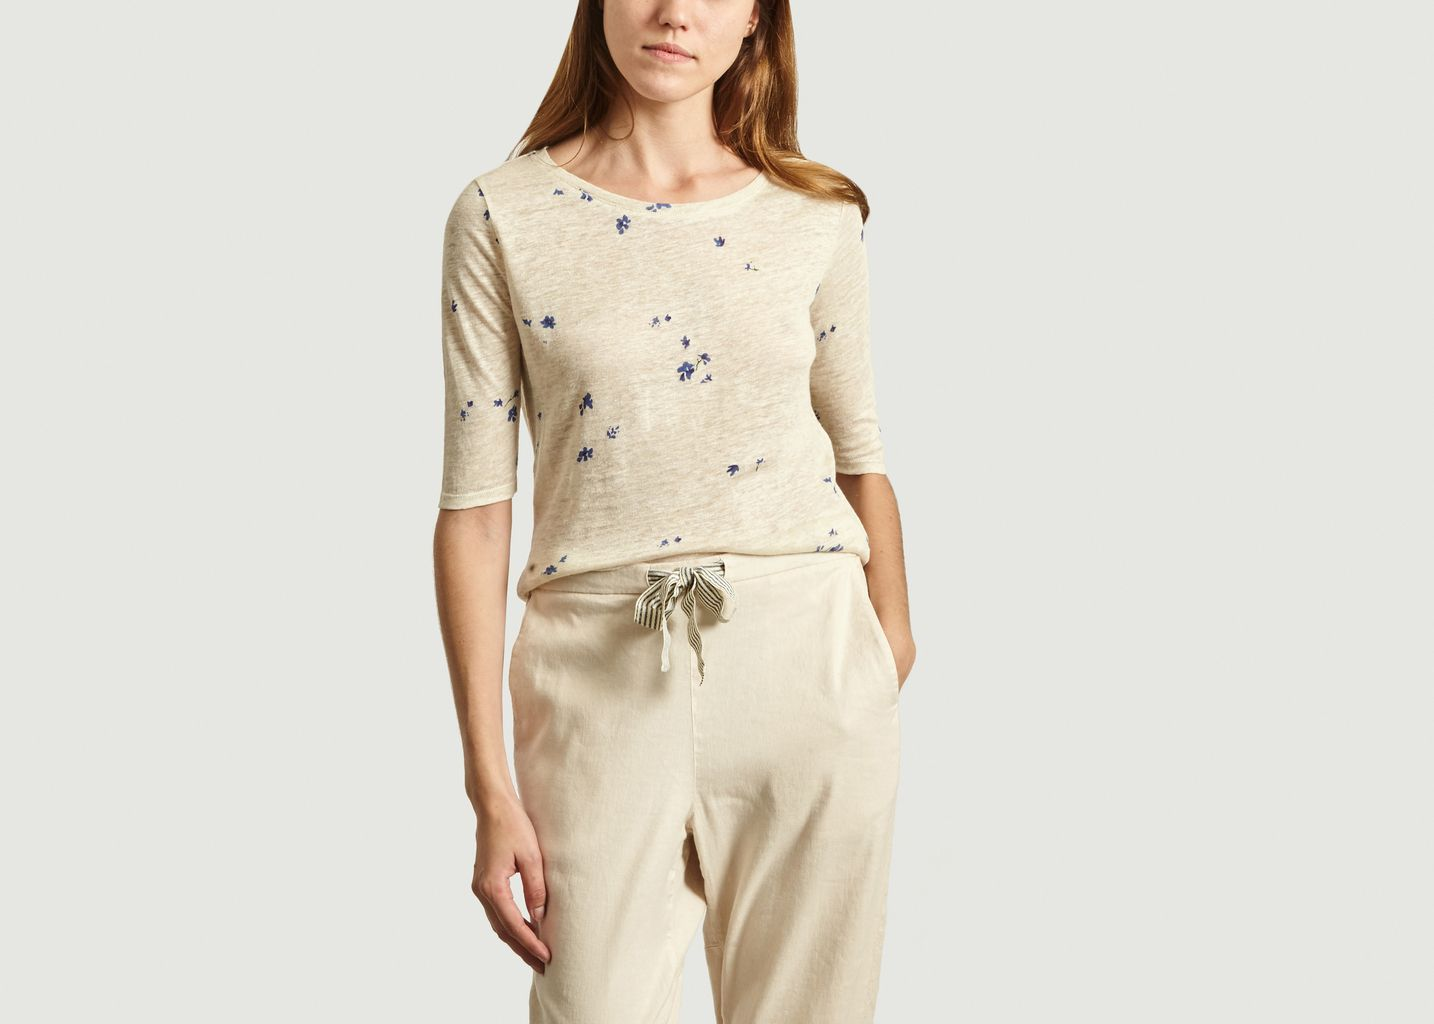 T-Shirt Motif Fleuri En Lin Seas - Bellerose